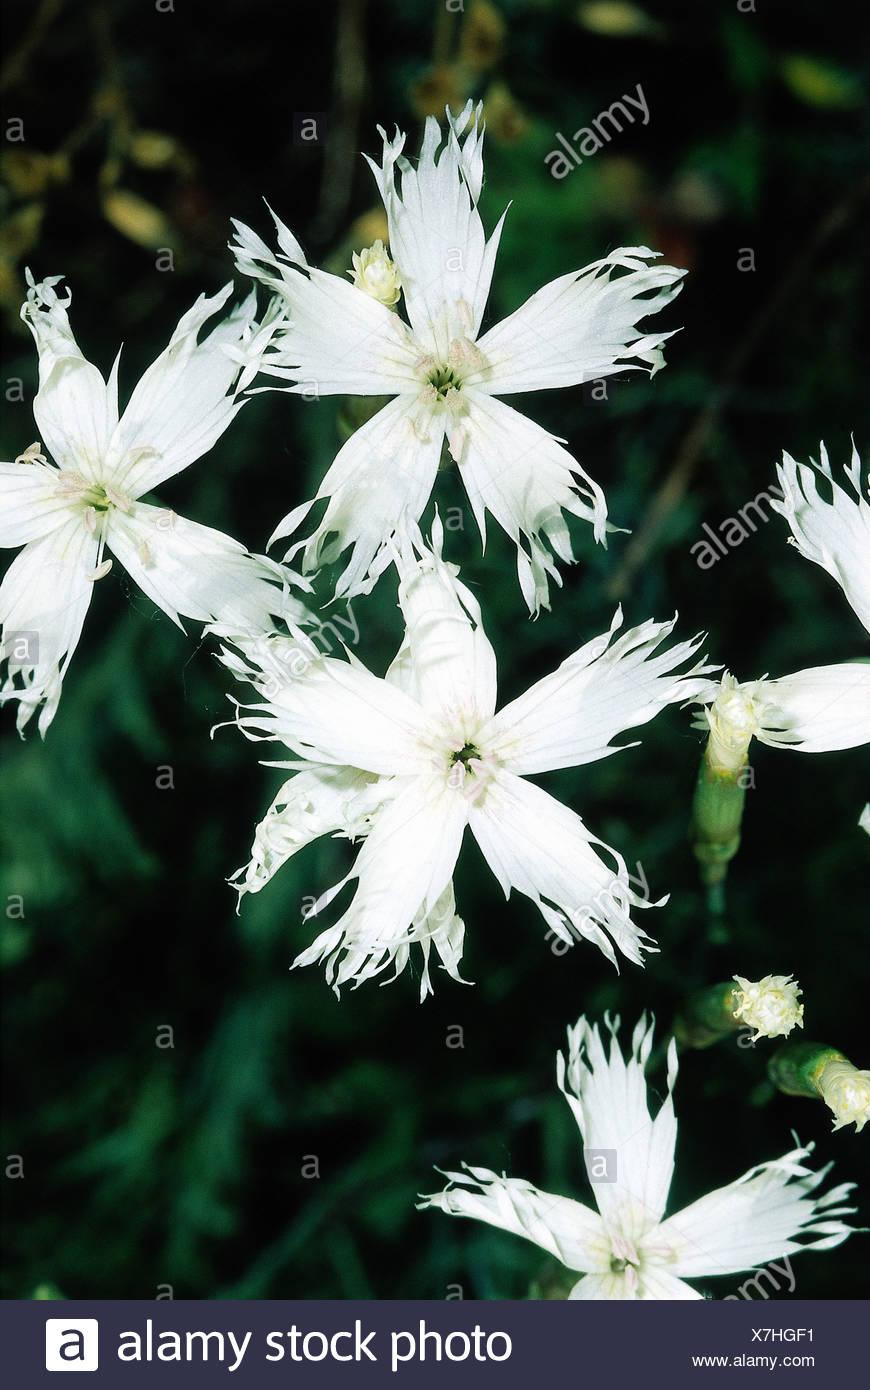 """botany, pink, (Dianthus), ""Hainburger Federnelke"", (Dianthus lumnitzeri), blossoms, white, blooming, flowering, Plumaris, Car Stock Photo"